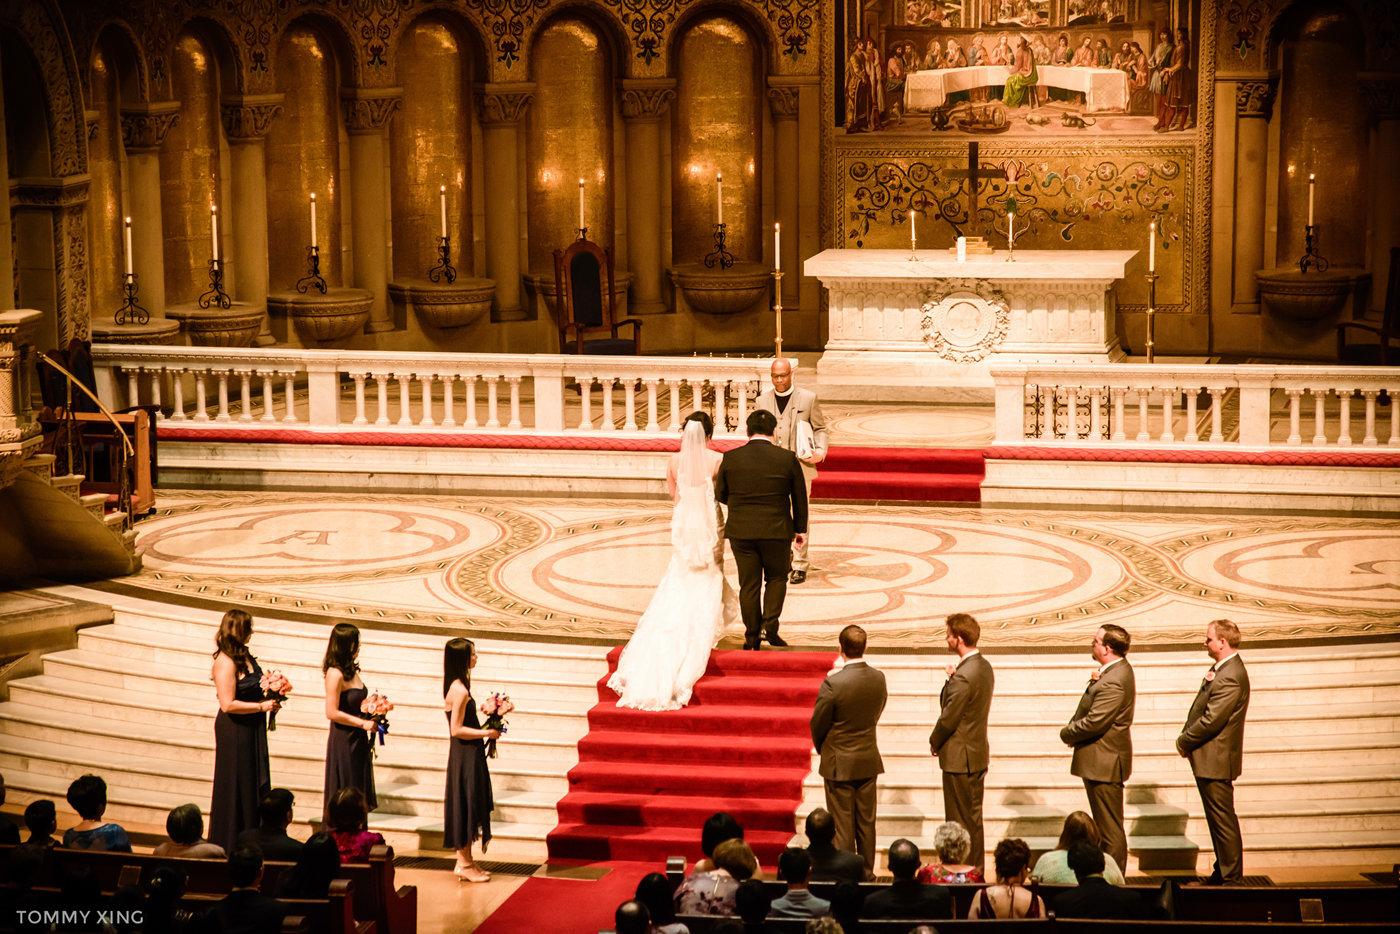 STANFORD MEMORIAL CHURCH WEDDING - Wenjie & Chengcheng - SAN FRANCISCO BAY AREA 斯坦福教堂婚礼跟拍 - 洛杉矶婚礼婚纱照摄影师 Tommy Xing Photography093.jpg